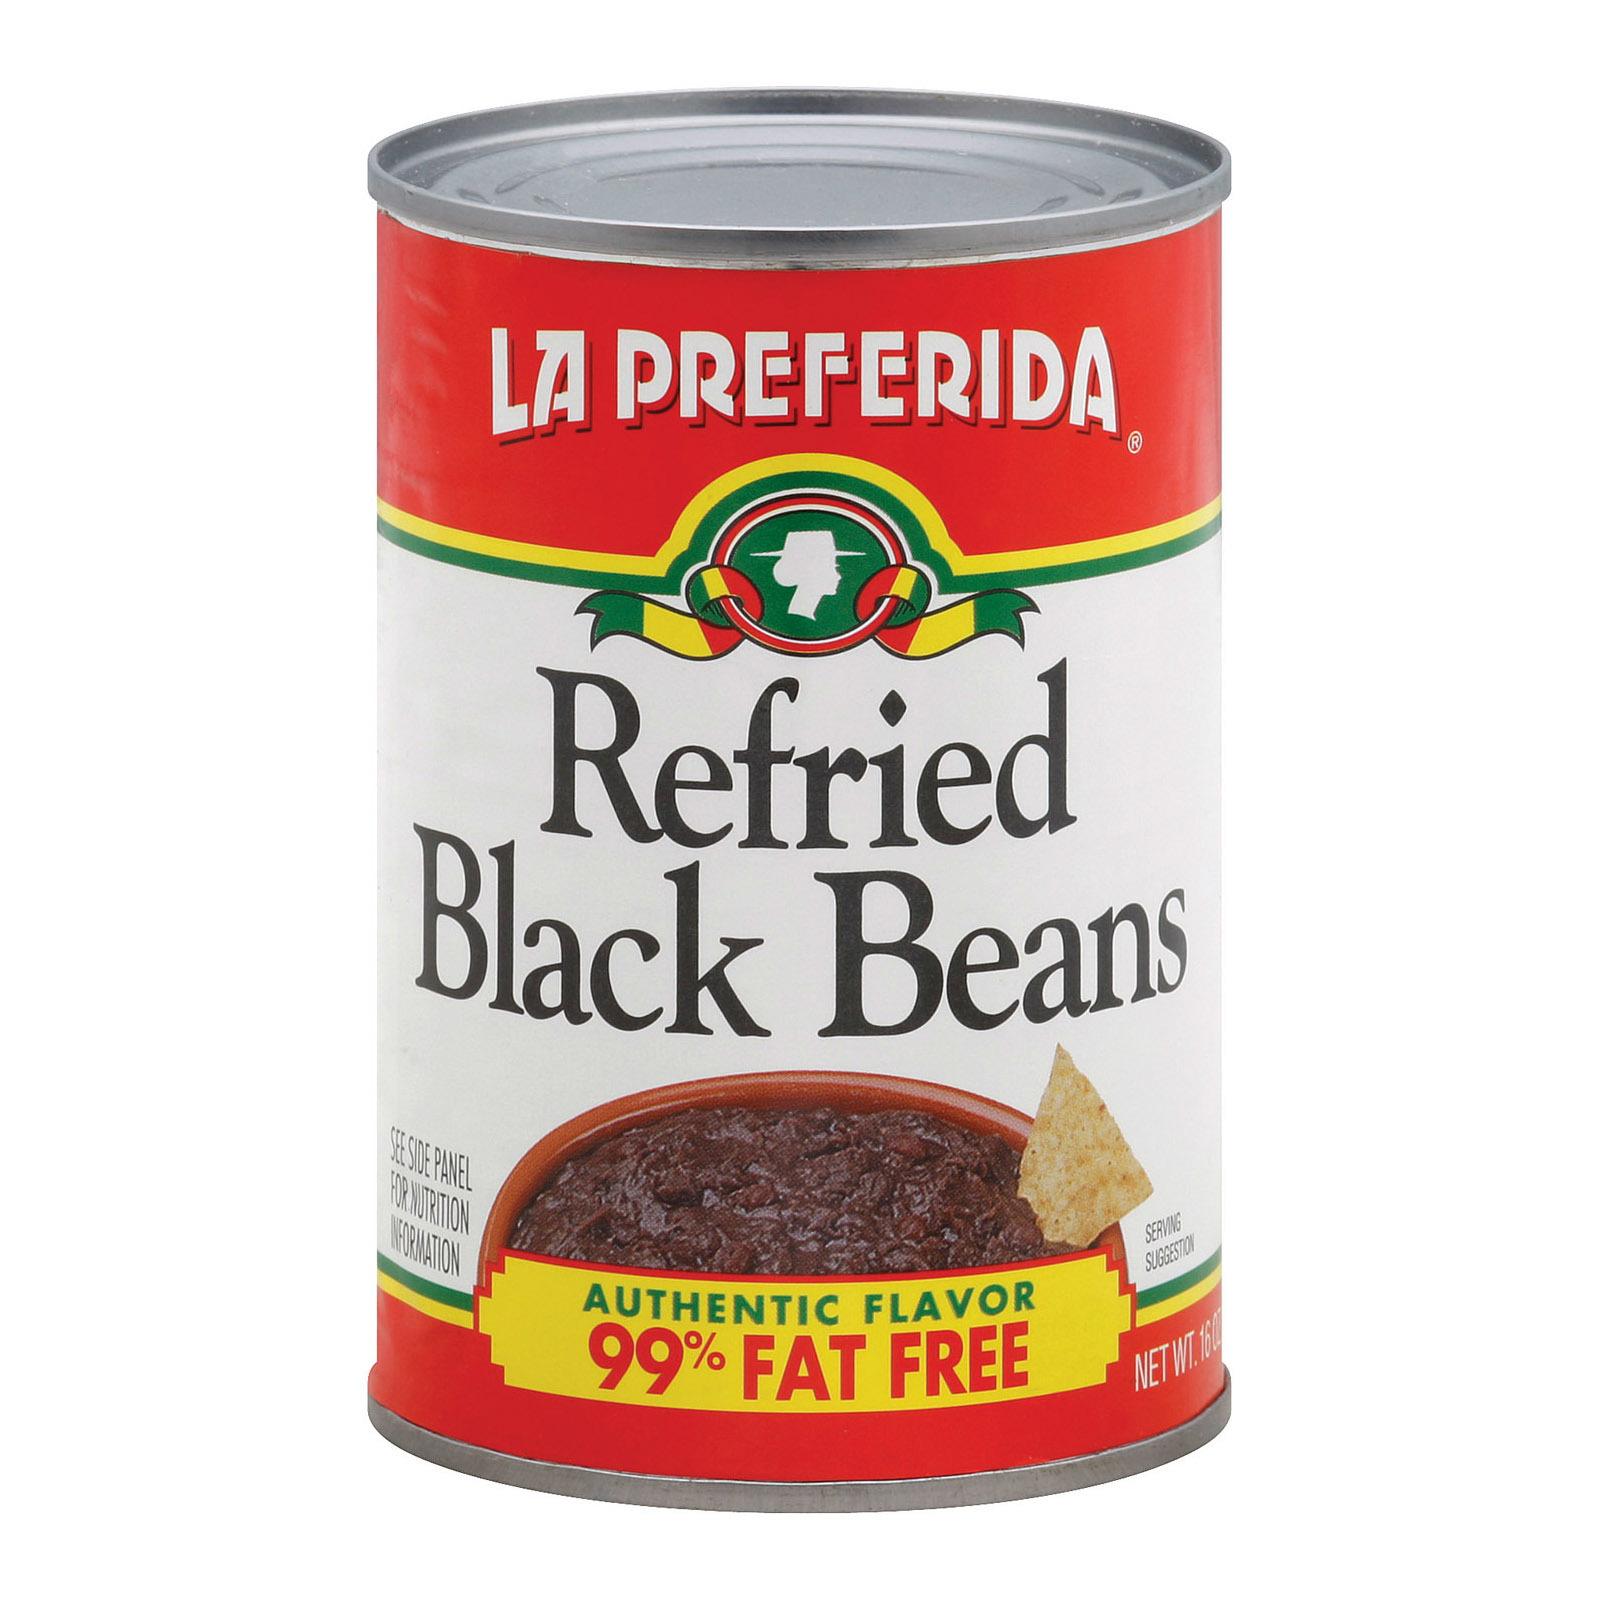 La Preferida Refried Beans - Black - Fat Free - Case of 12 - 16 oz